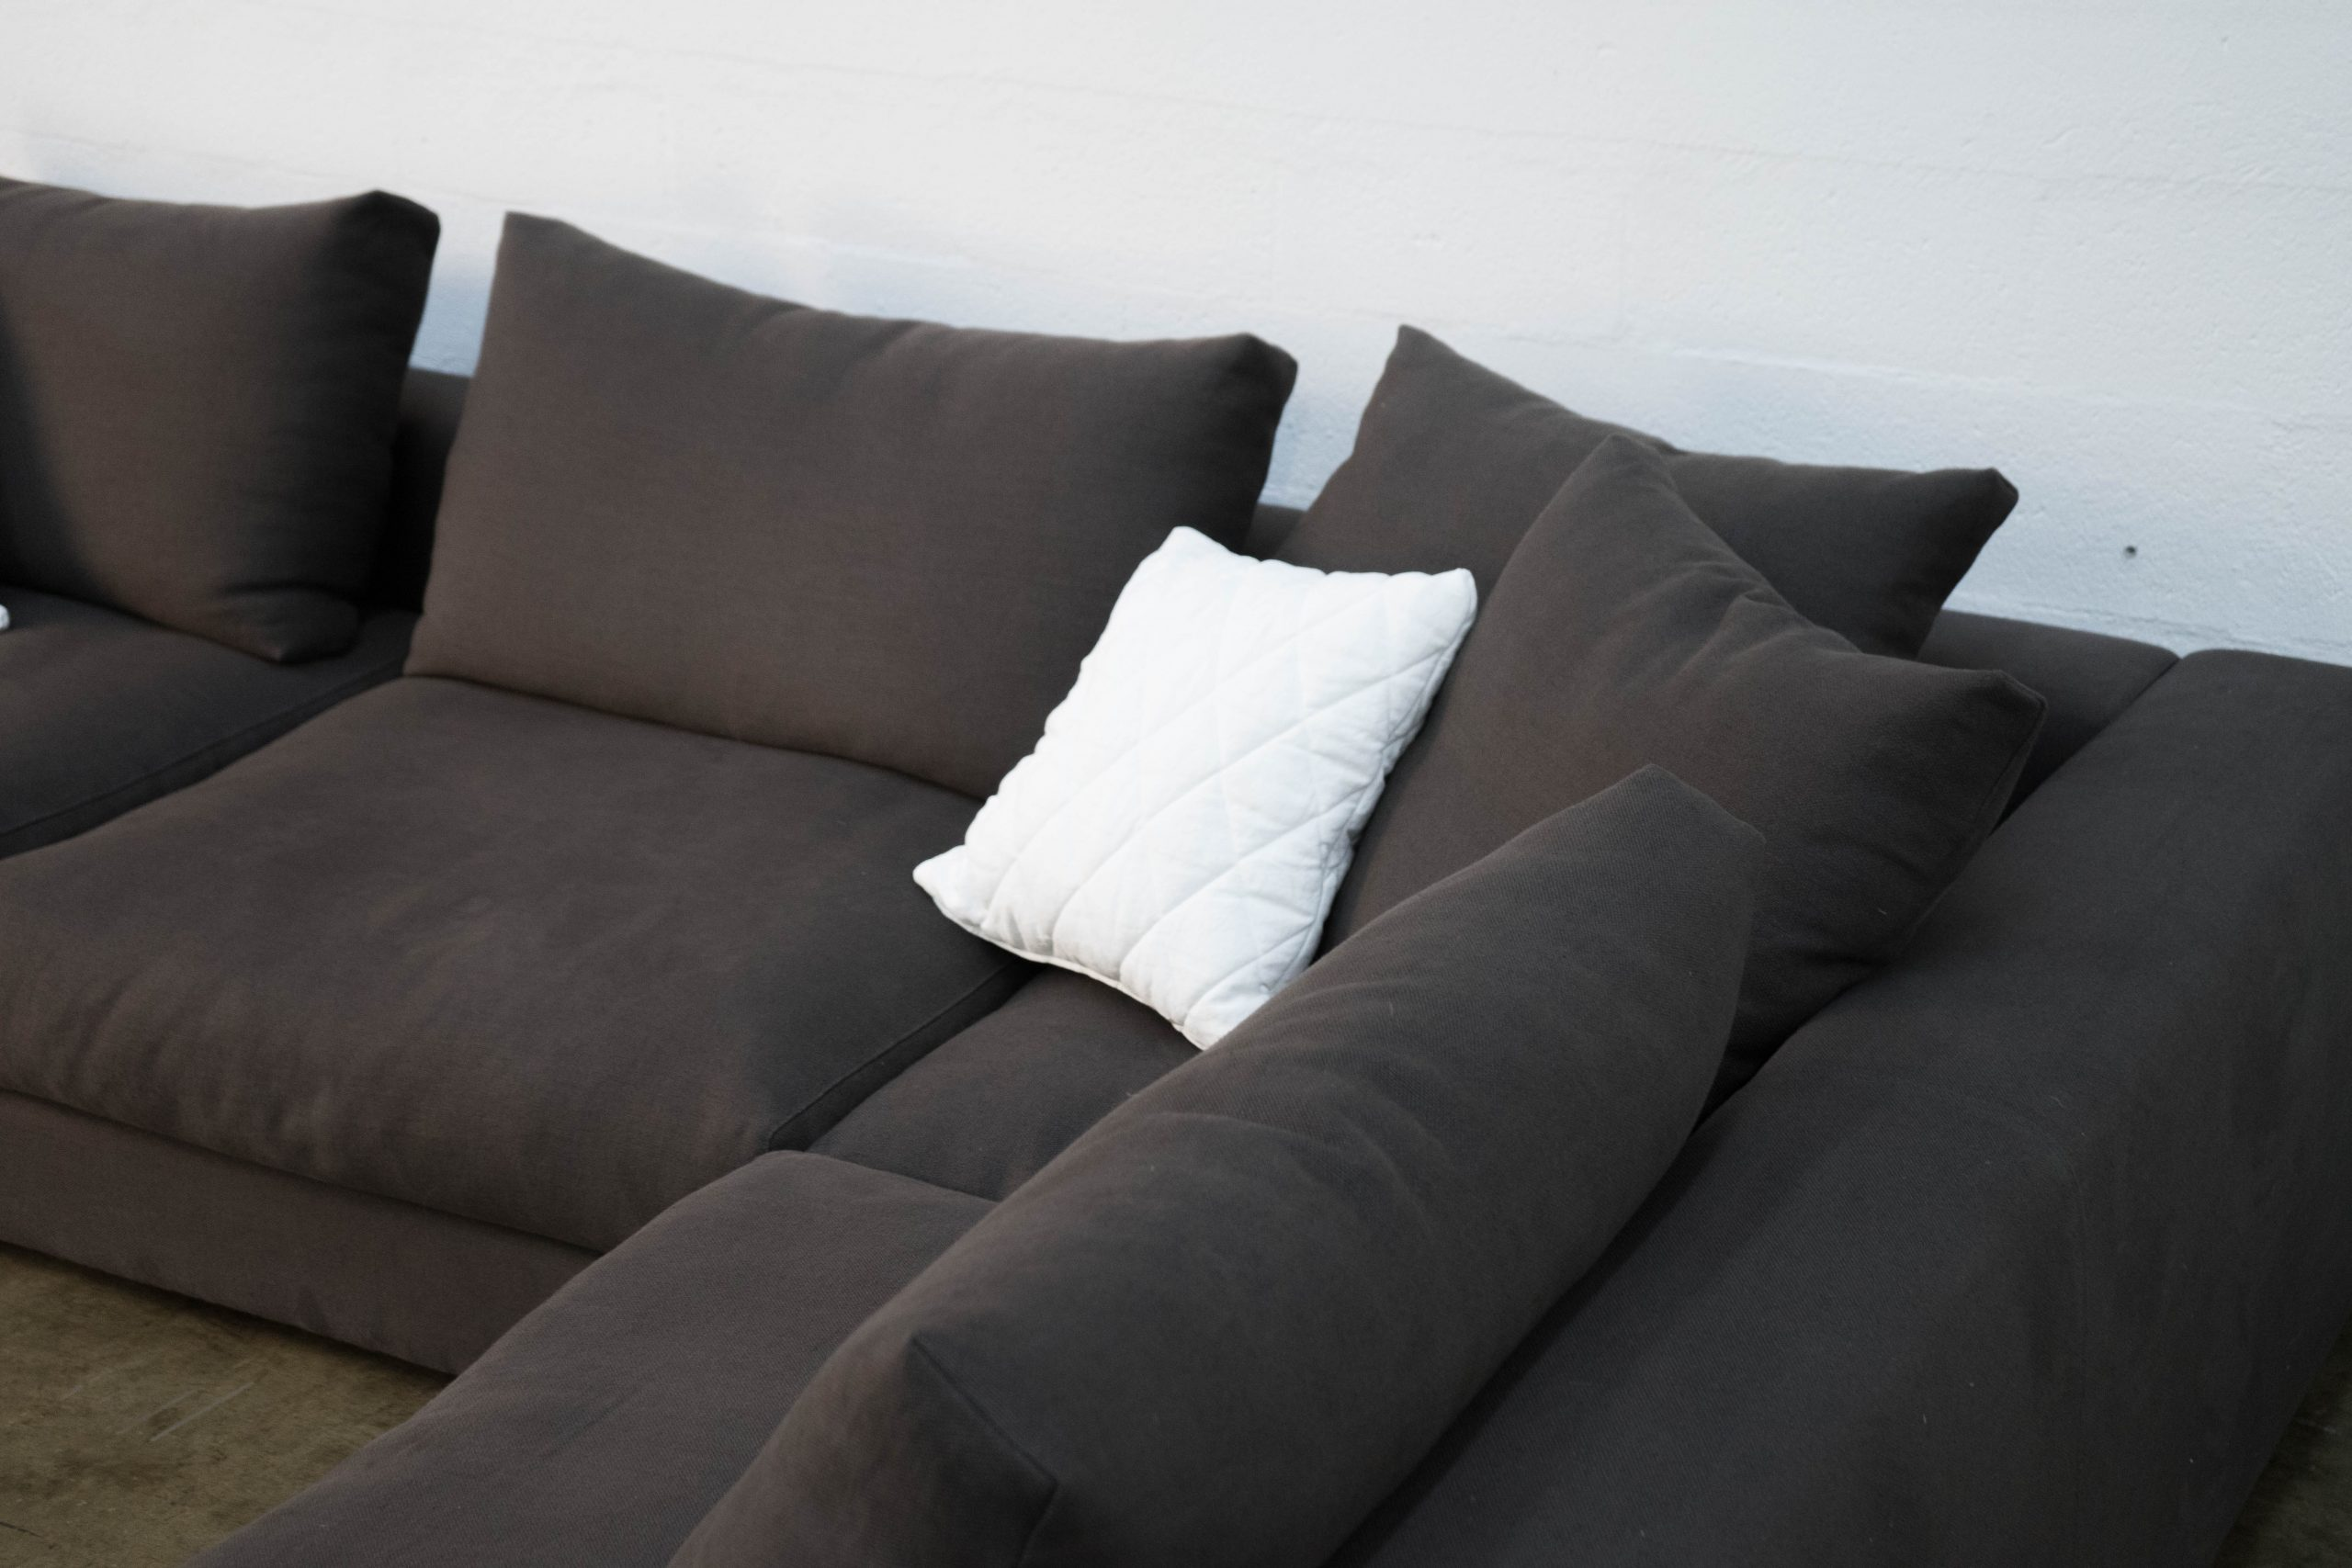 sofa grande decorativo seleccion color a medida a mano